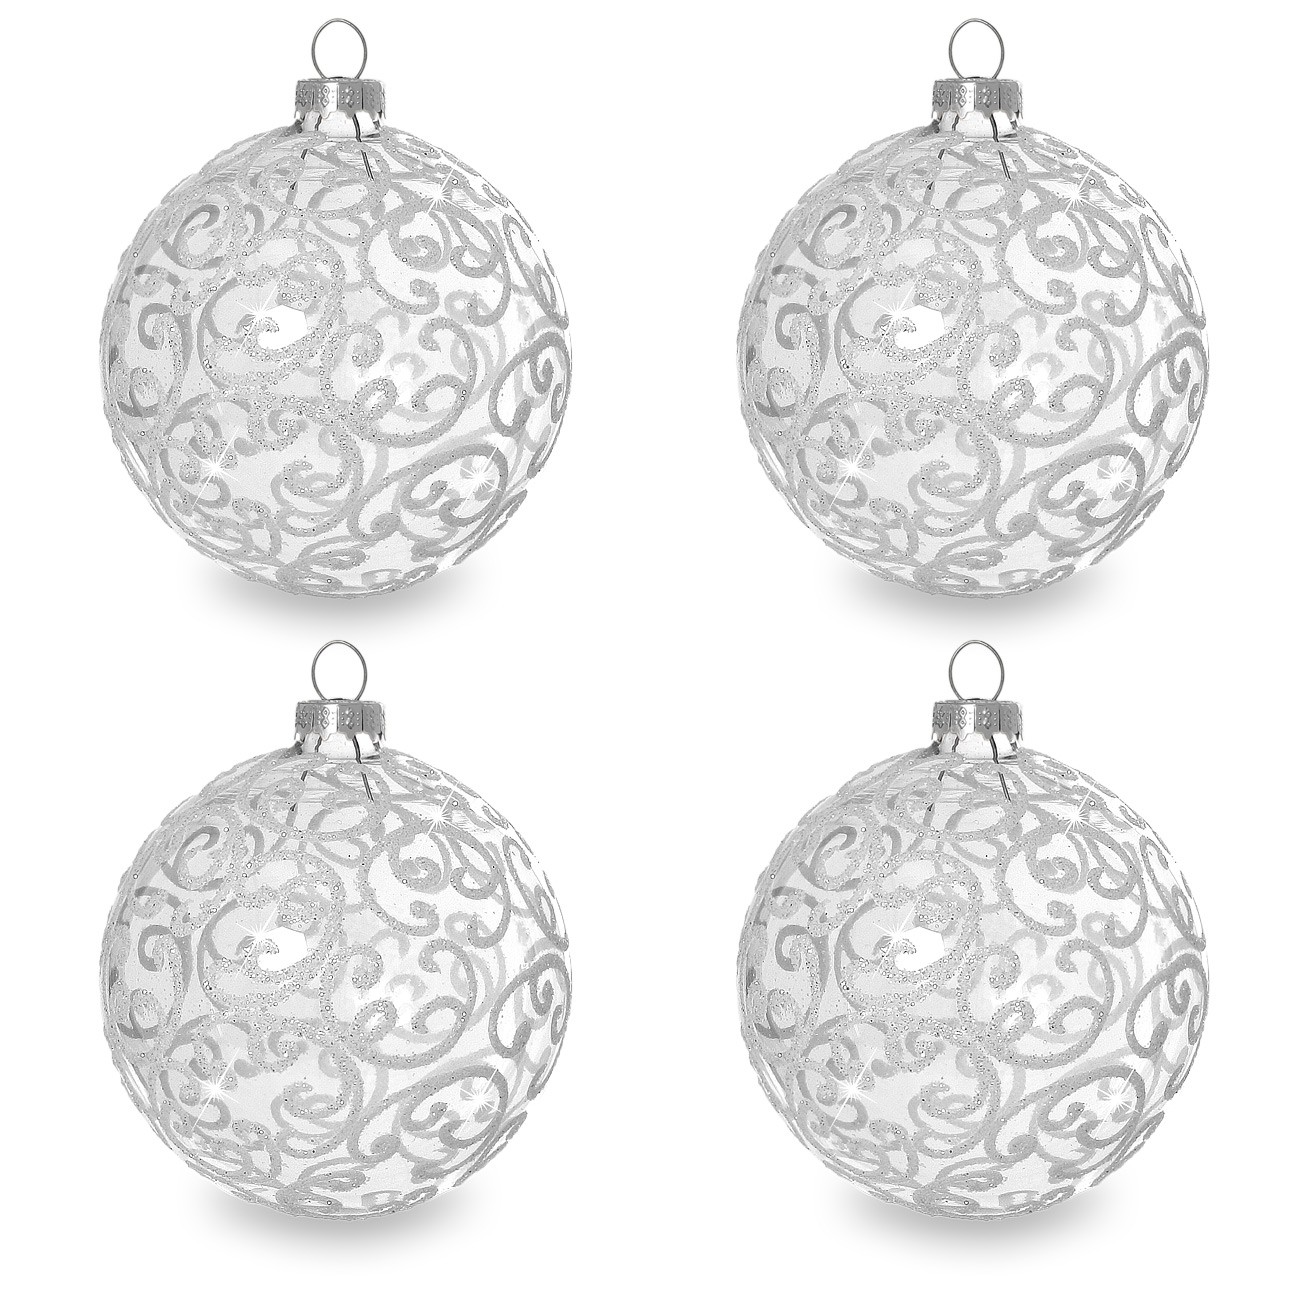 sikora christbaumkugeln aus glas mit klassischer verzierung florence klar glas 4er set. Black Bedroom Furniture Sets. Home Design Ideas